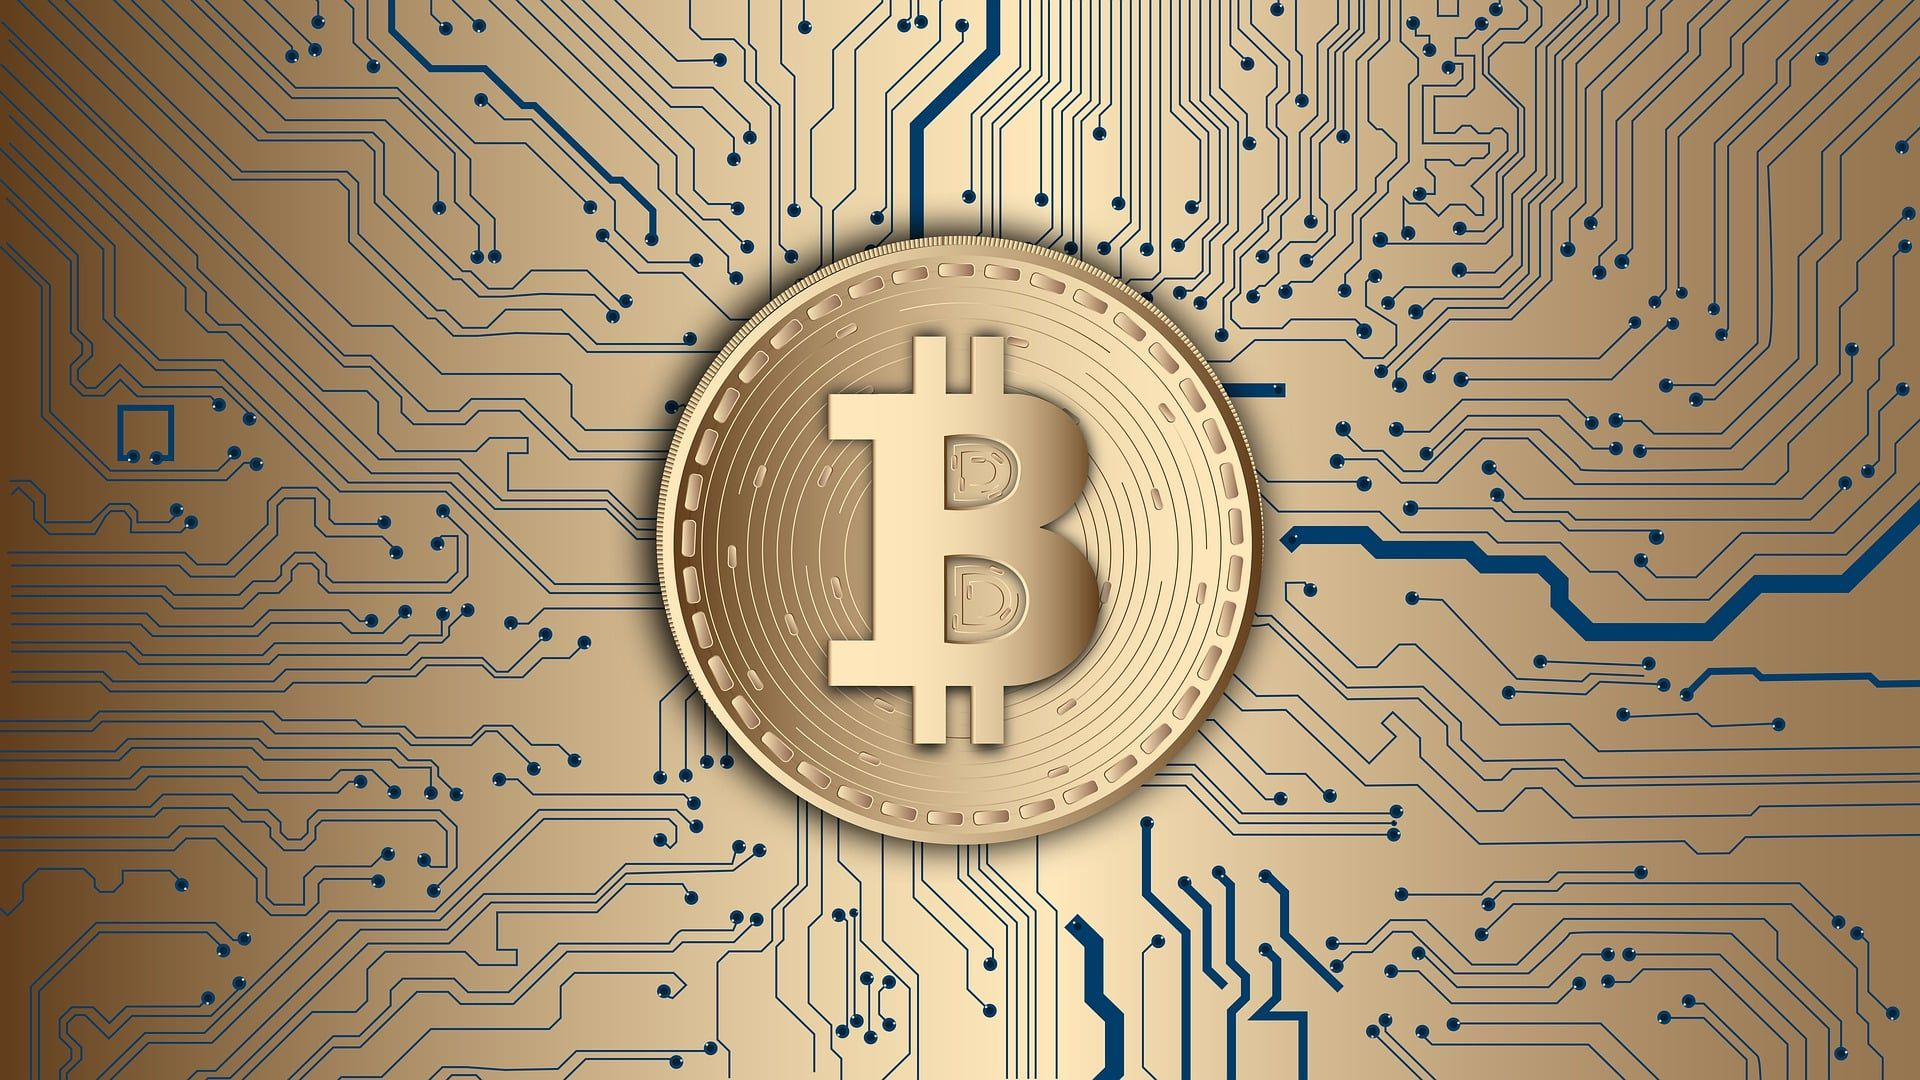 Kopen en verkopen bitcoins free tips for sports betting in vegas